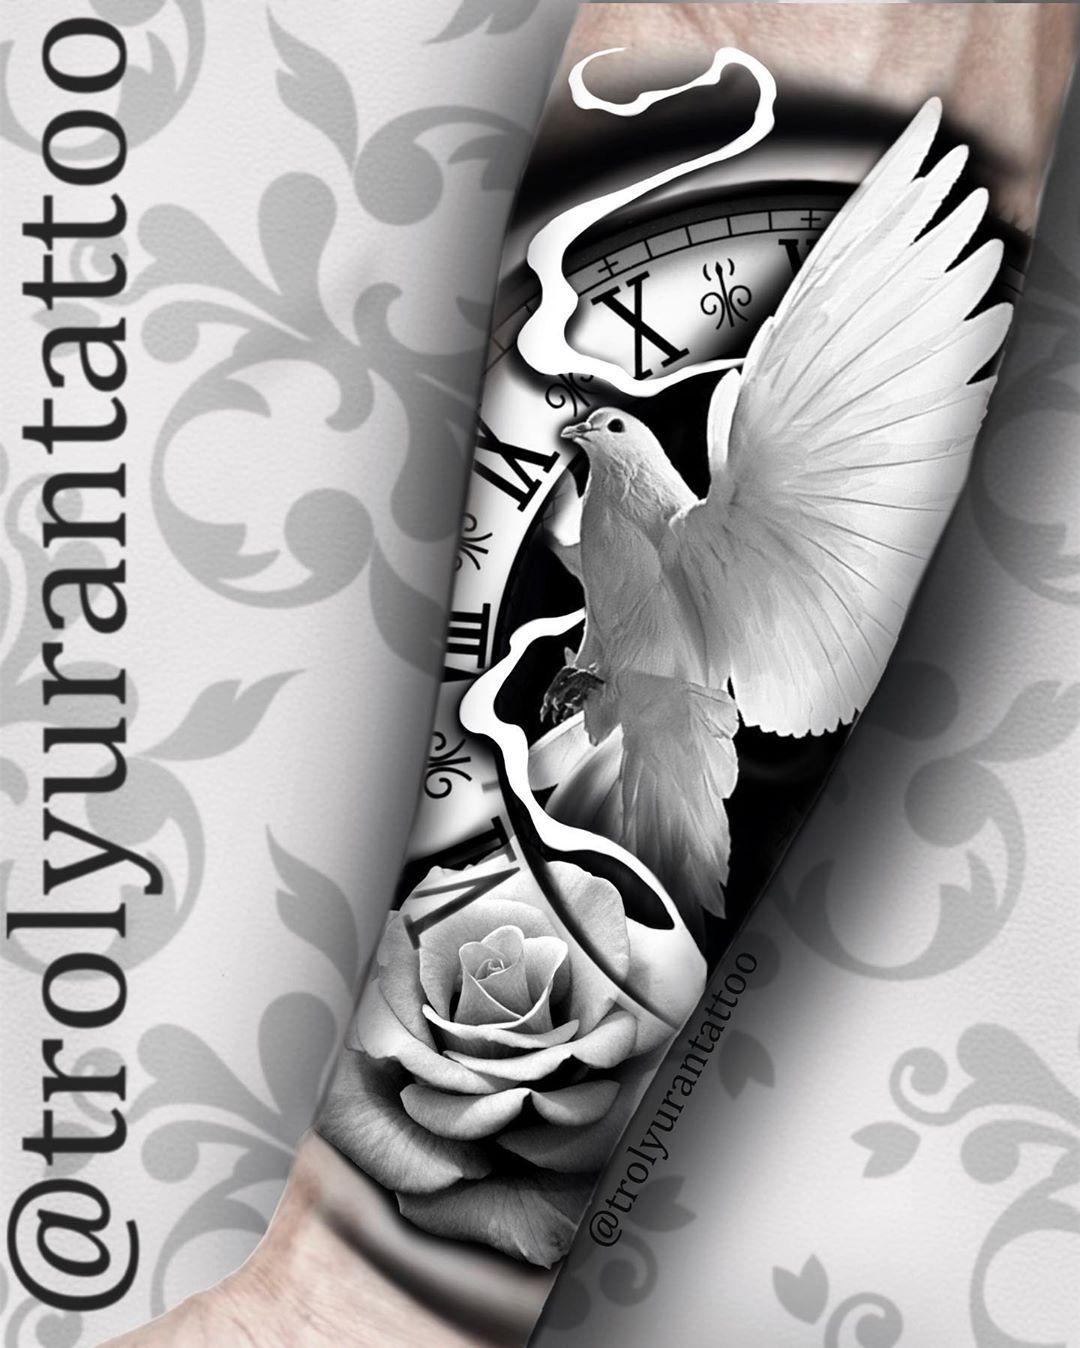 Diseño disponible a precio REDUCIDO .⭕️ Diseños personalizados para cada cliente. ❗️❗️❗️ Si estas interesado, pideme el tuyo❗️Para citas y el presupuesto  MD o WhatsApp 648052661 . . . . . . .  #tattoomadrid #tattoolovers #tatuajemadrid #tattoodesigner #tigretattoo #tattoodiseño #bocetos #tatoolove #parla #tattooartist #drozdovtattoo #lovetattooing #tattoostudios #designtattoo #vikingtattoo #vikingos #trolyurantattoo